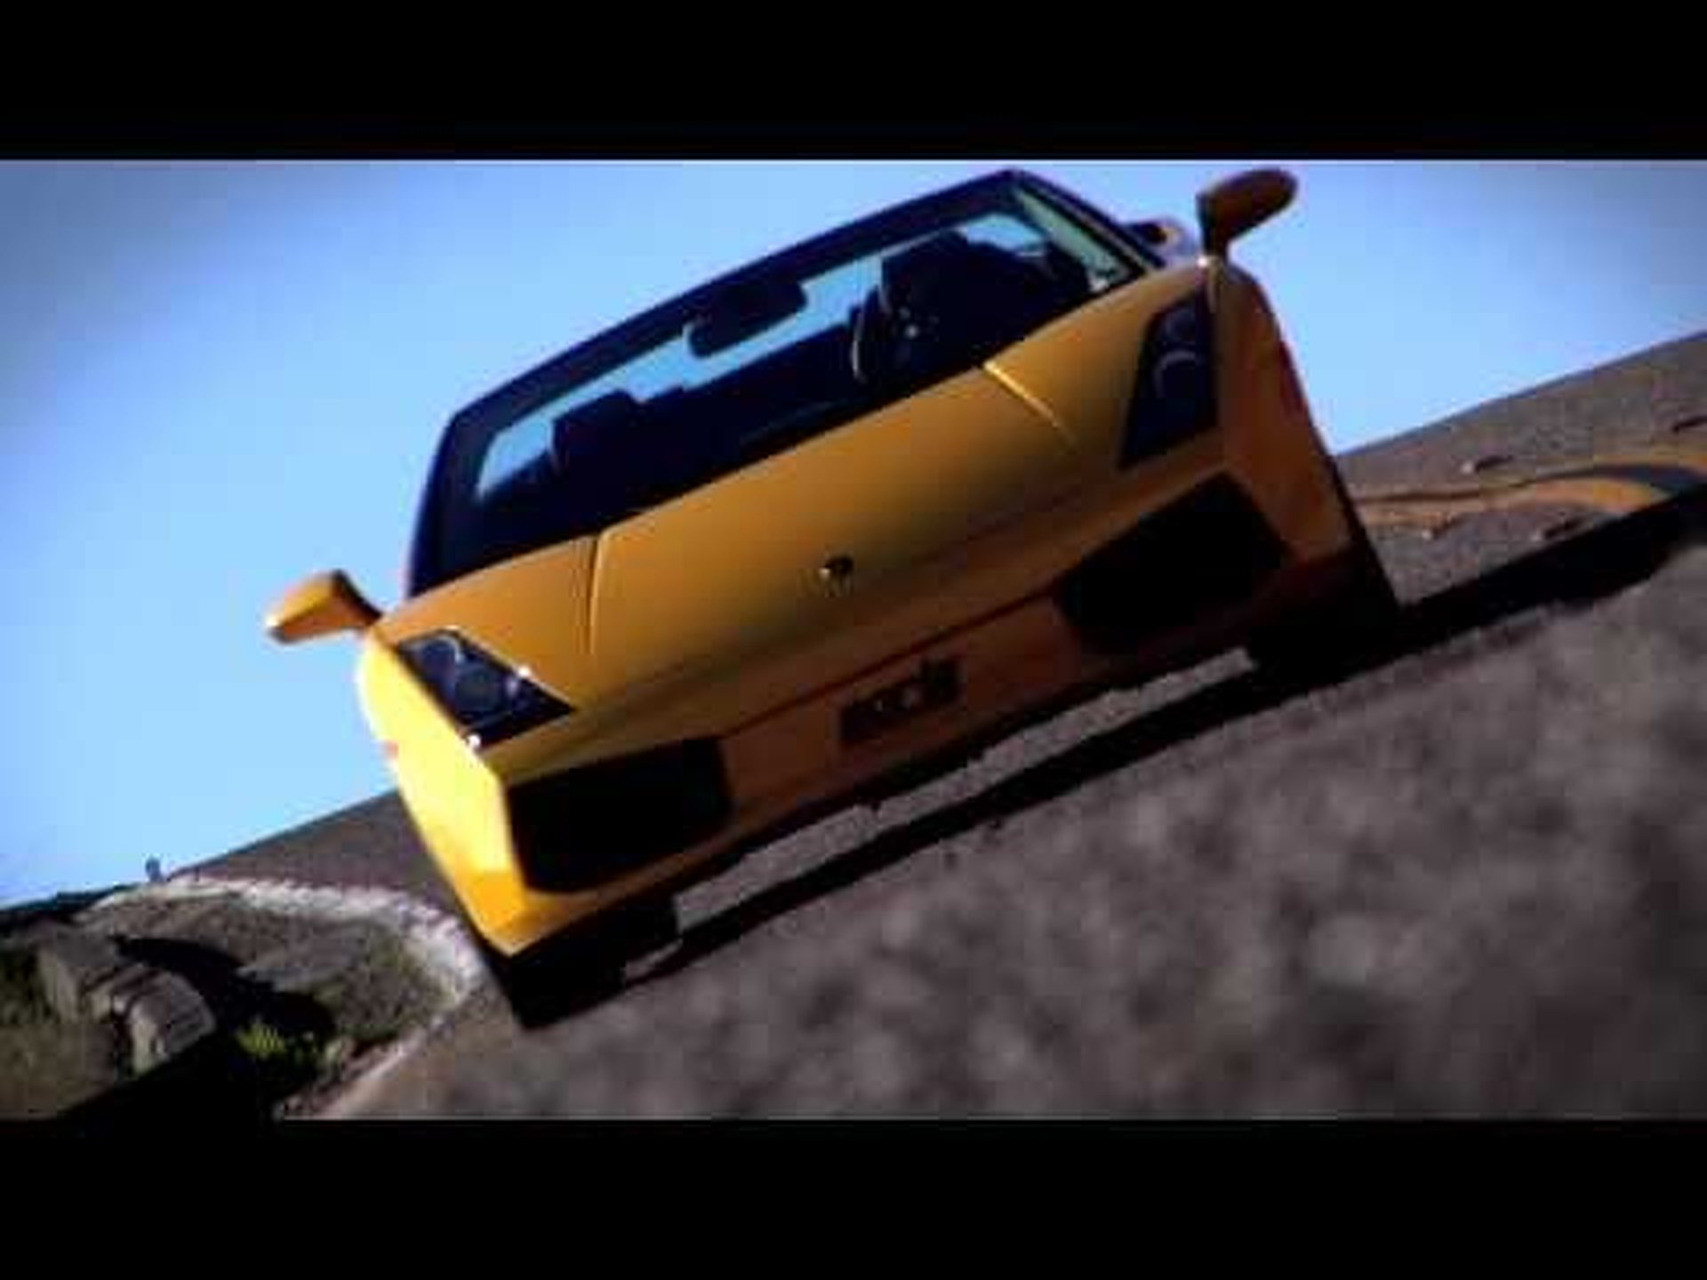 Lamborghini Bellissimo